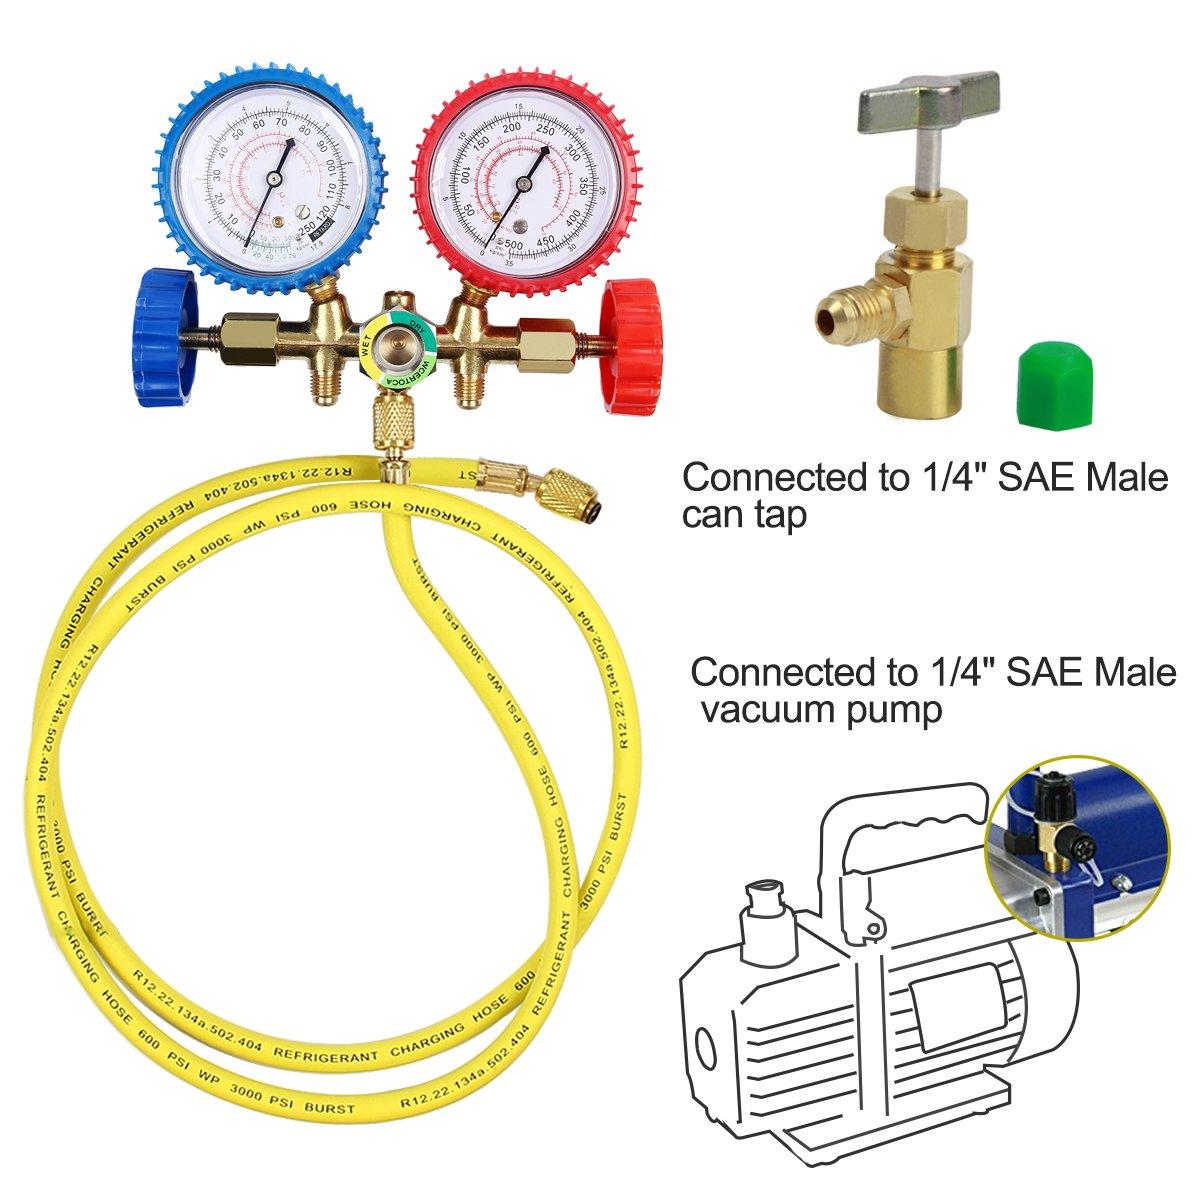 Latinaric Diagnostic Manifold Gauge Set Charging Hose R12 R22 R502 AC Refrigerant 3 FT